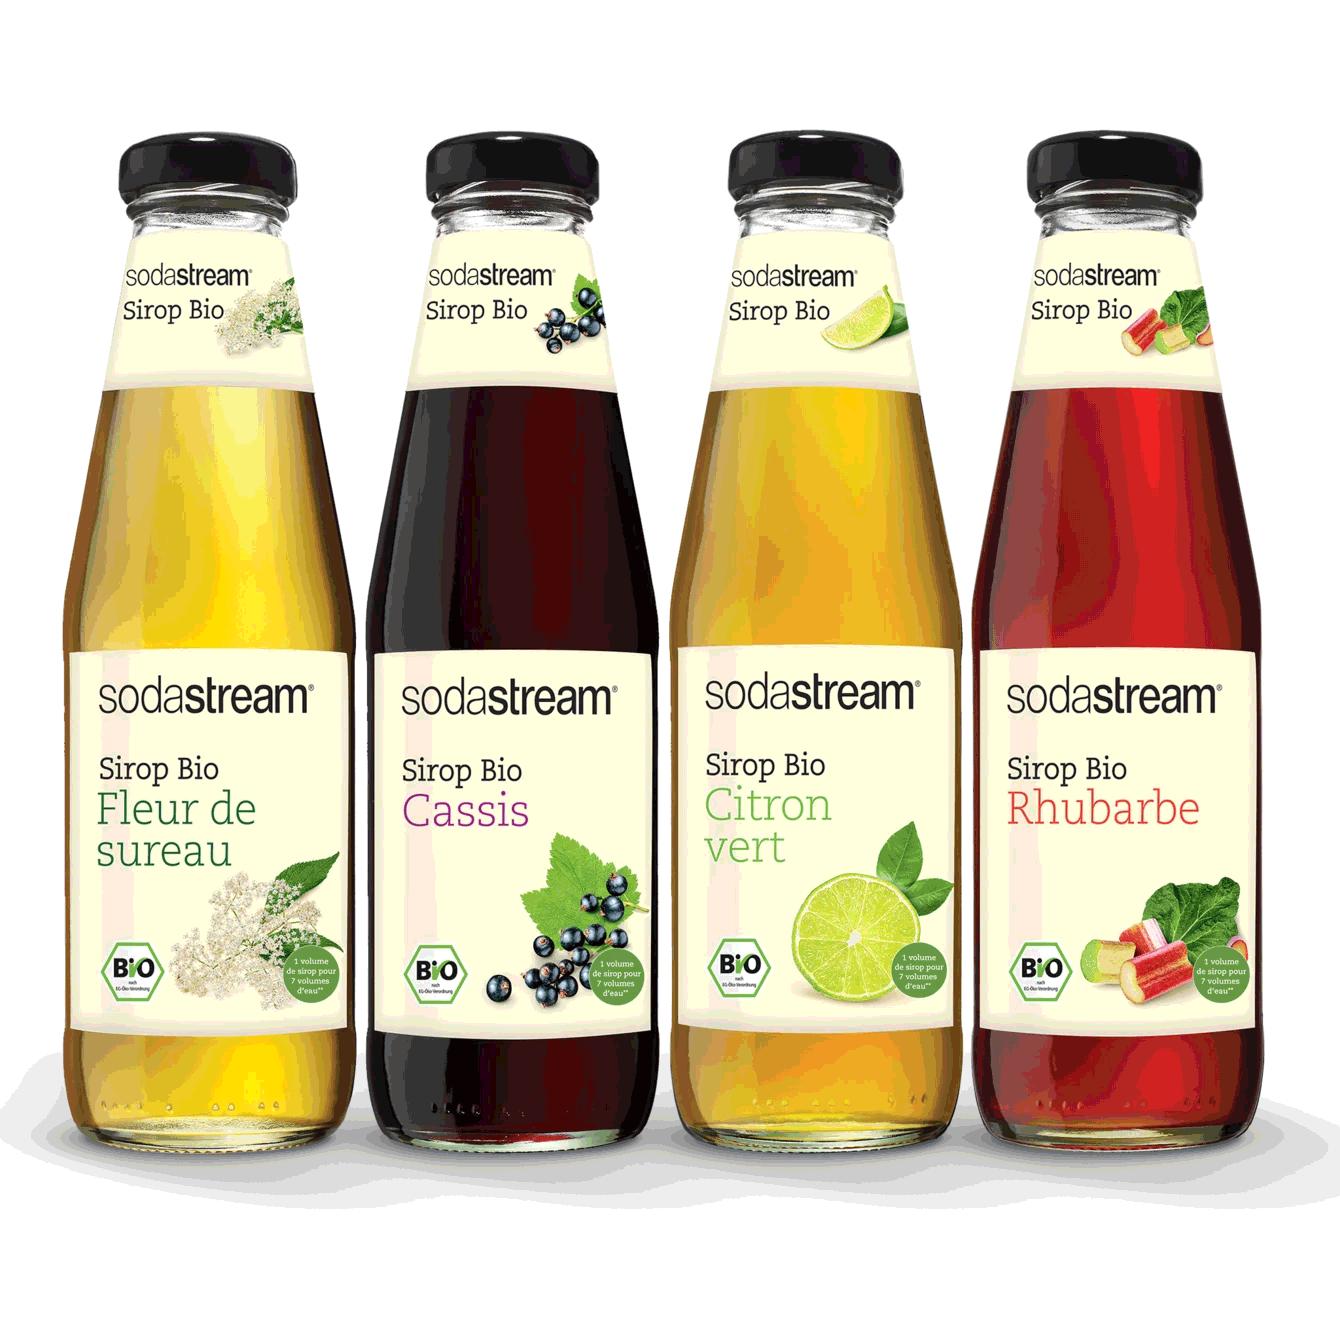 quatre bouteilles sirops bios sodastream